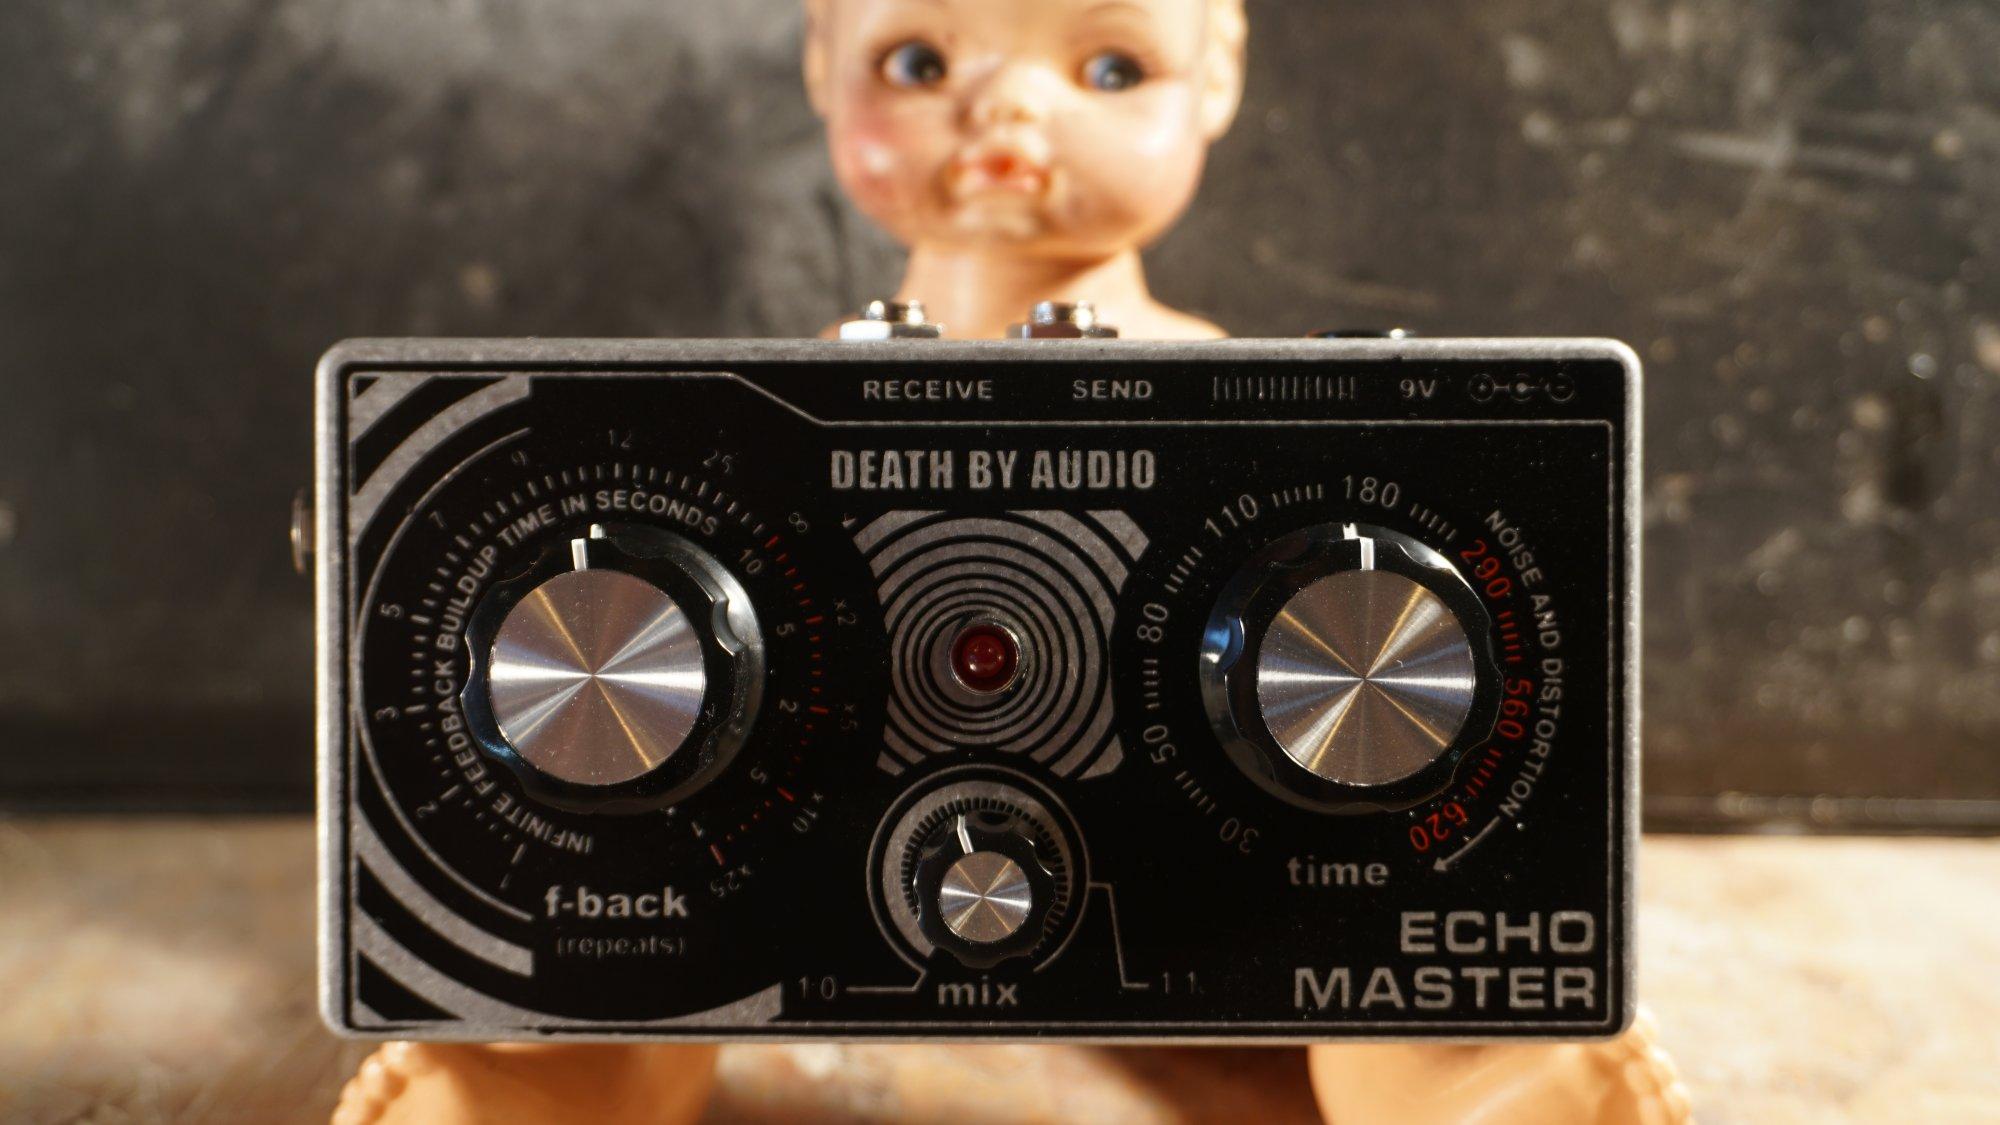 Echo Master